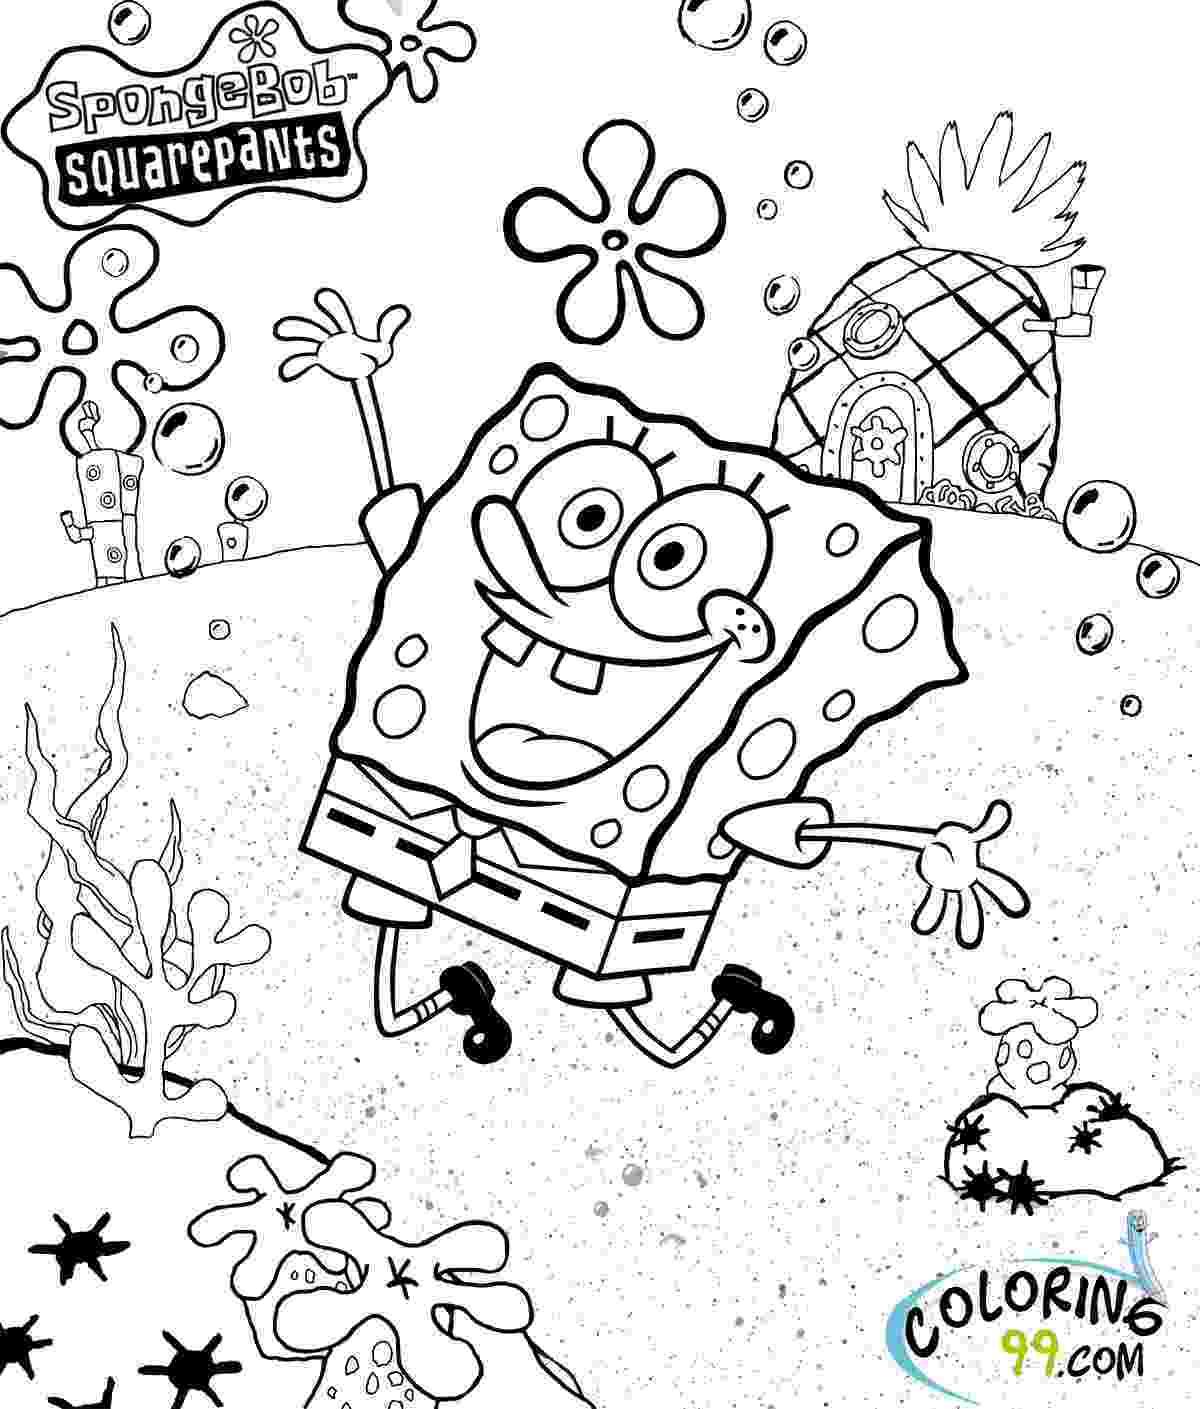 coloring spongebob printable spongebob coloring pages for kids cool2bkids coloring spongebob 1 3